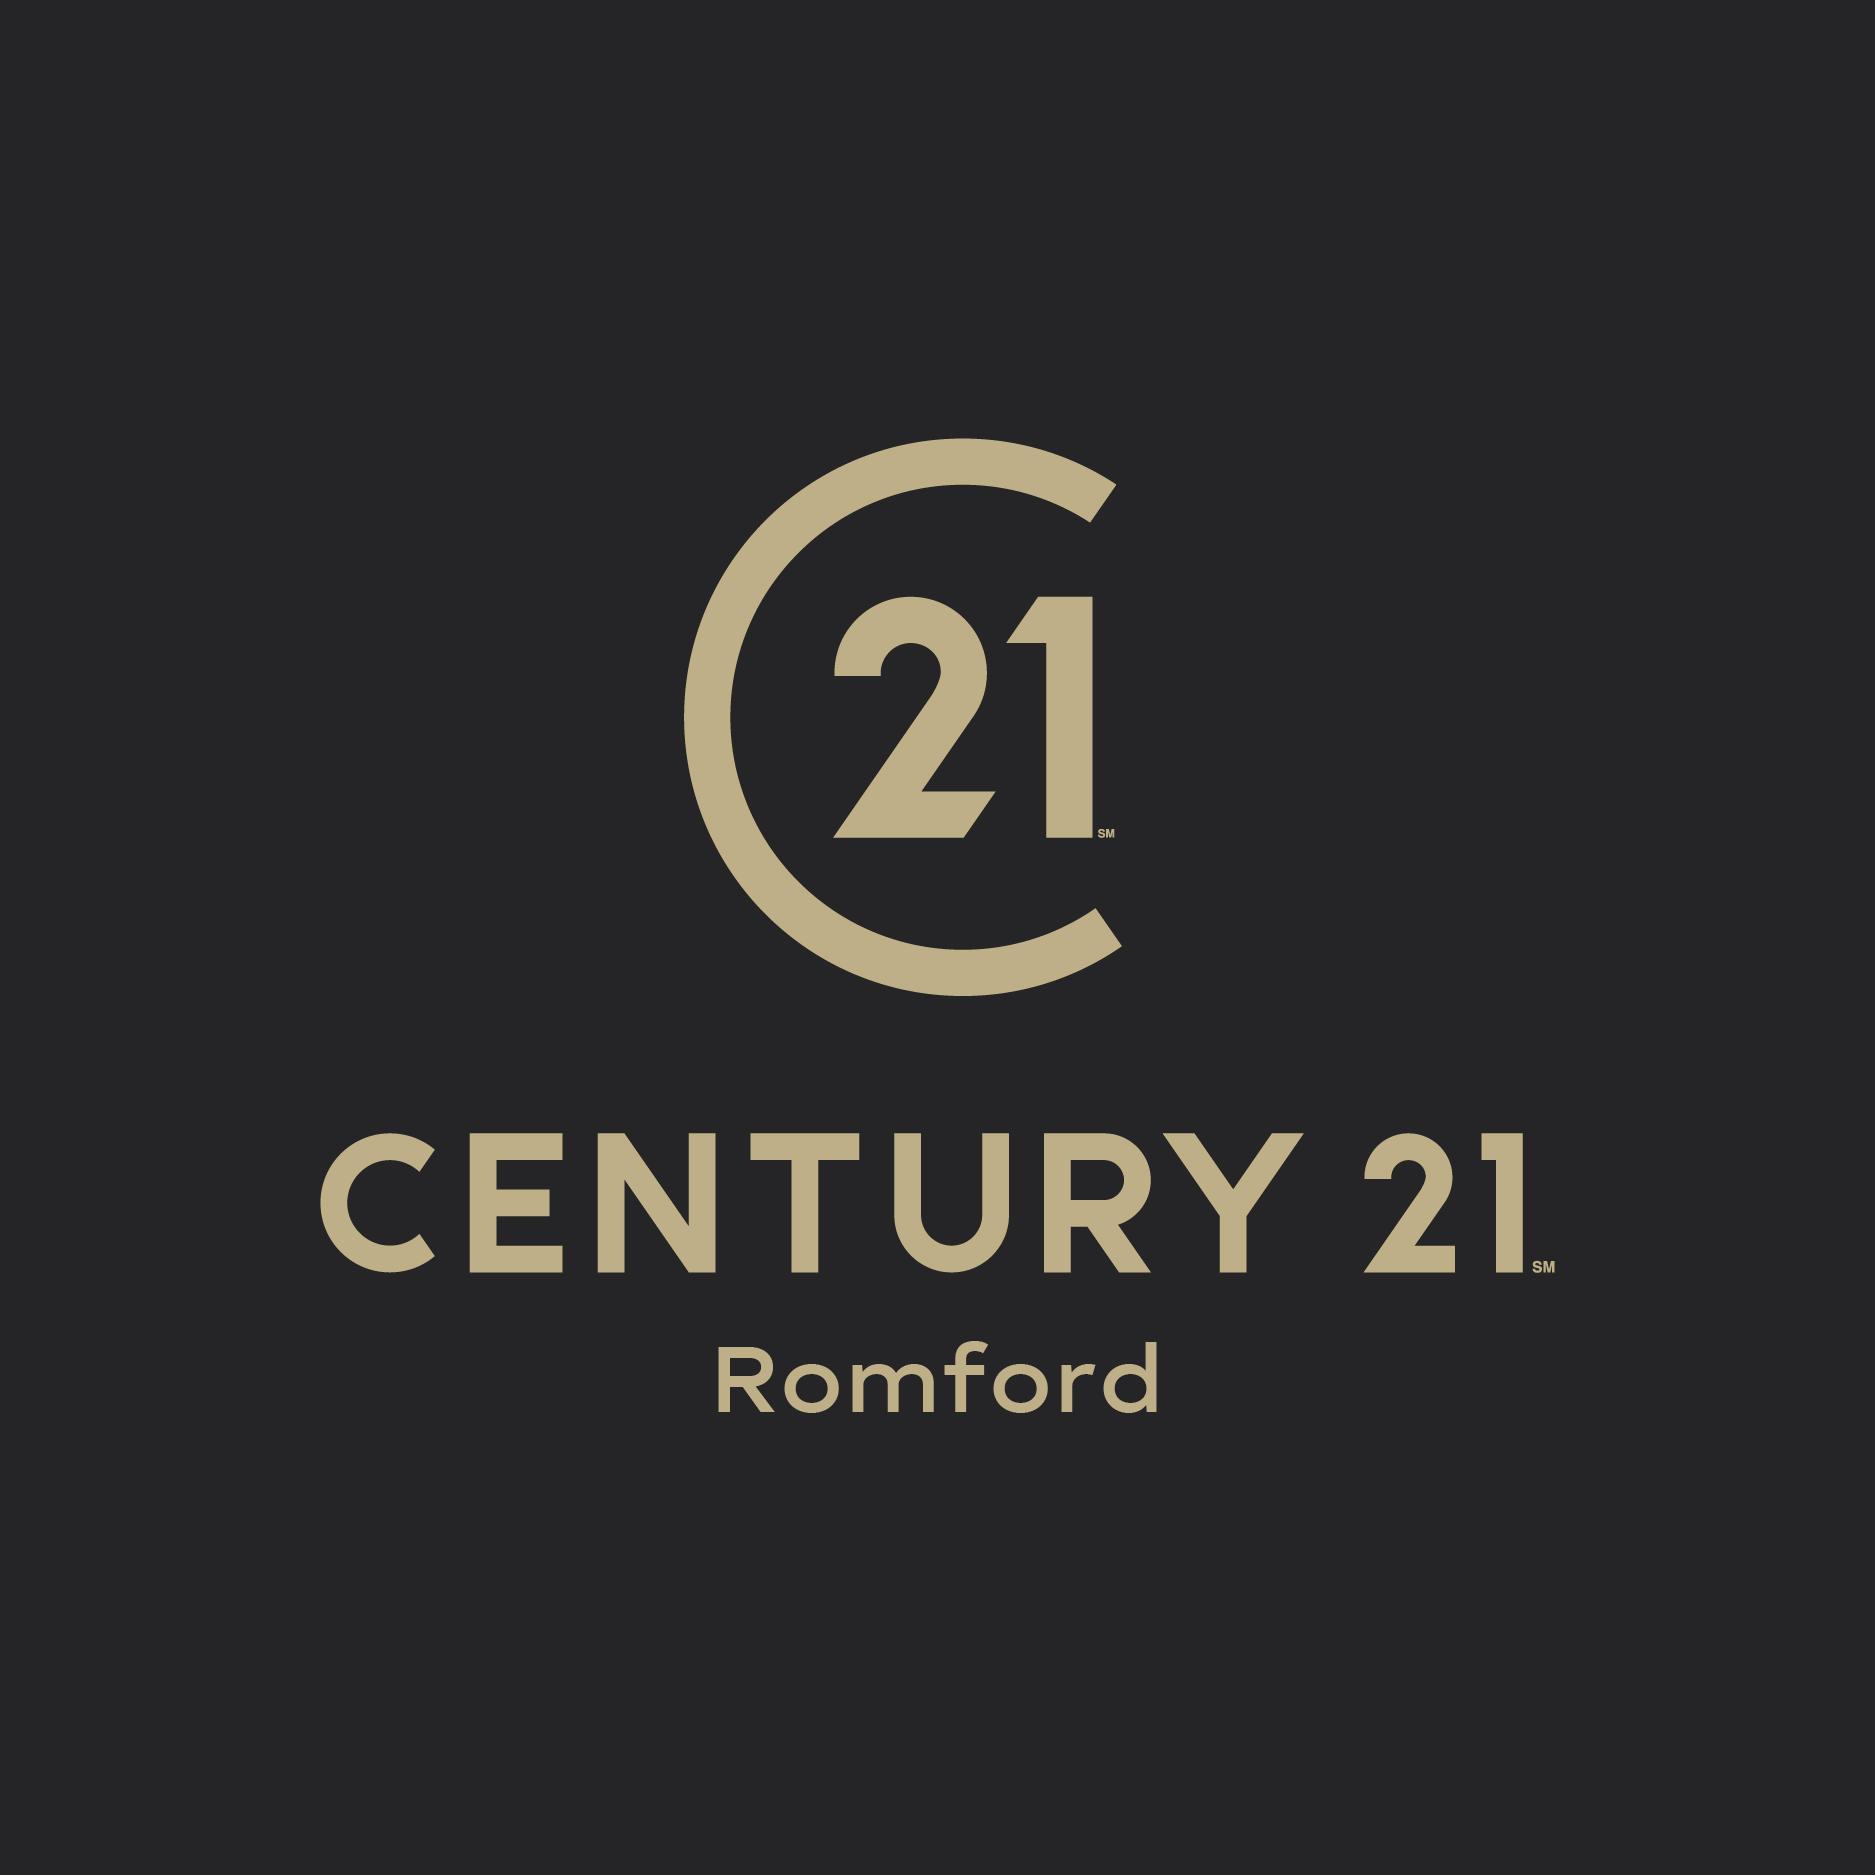 Century 21 - Romford